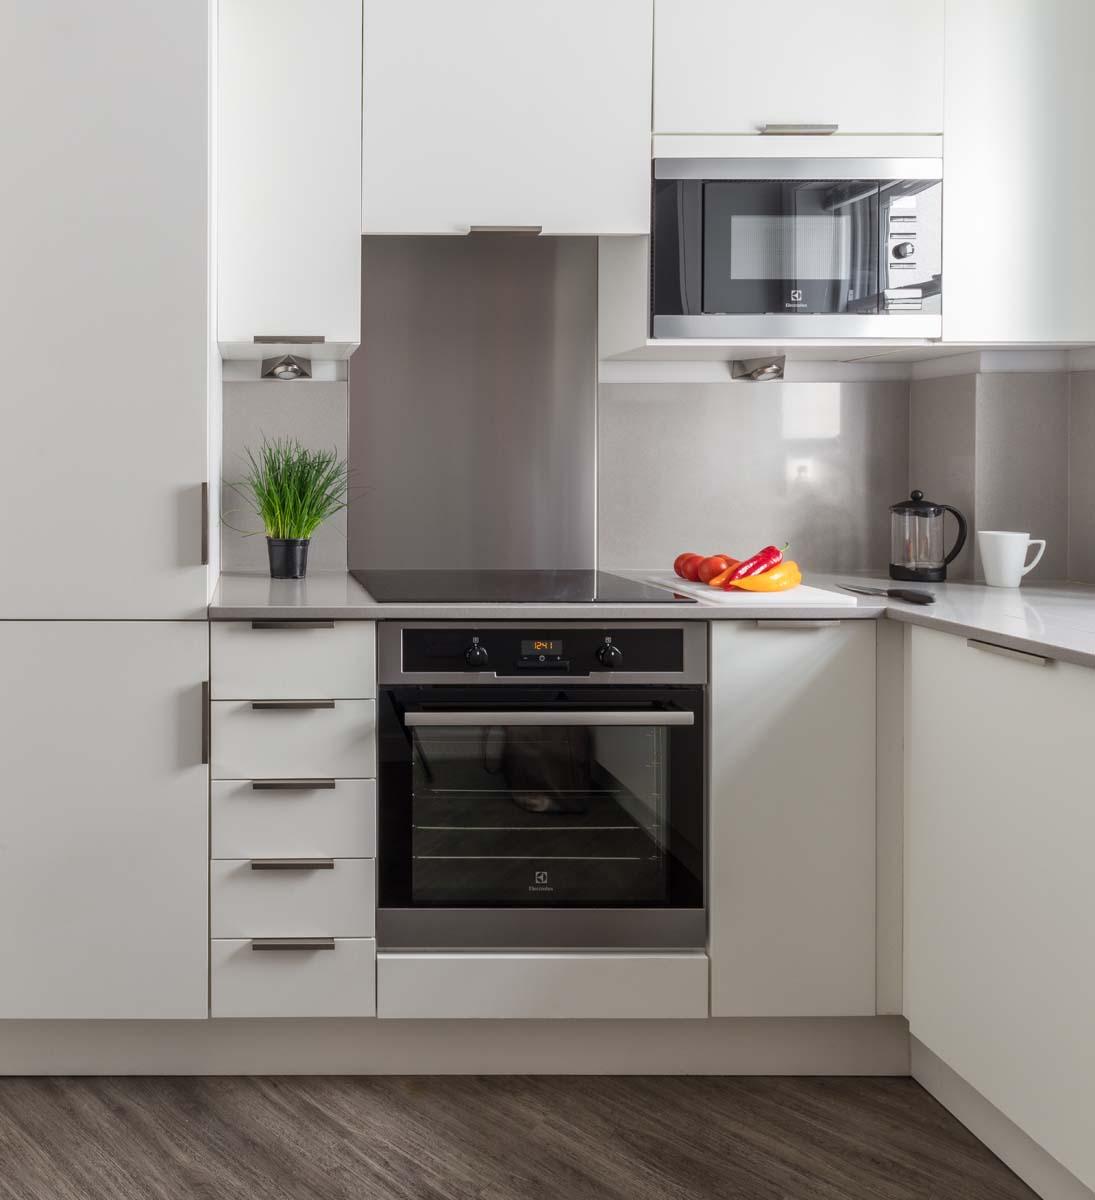 Oven at Saco Bath – St James's Parade - Citybase Apartments